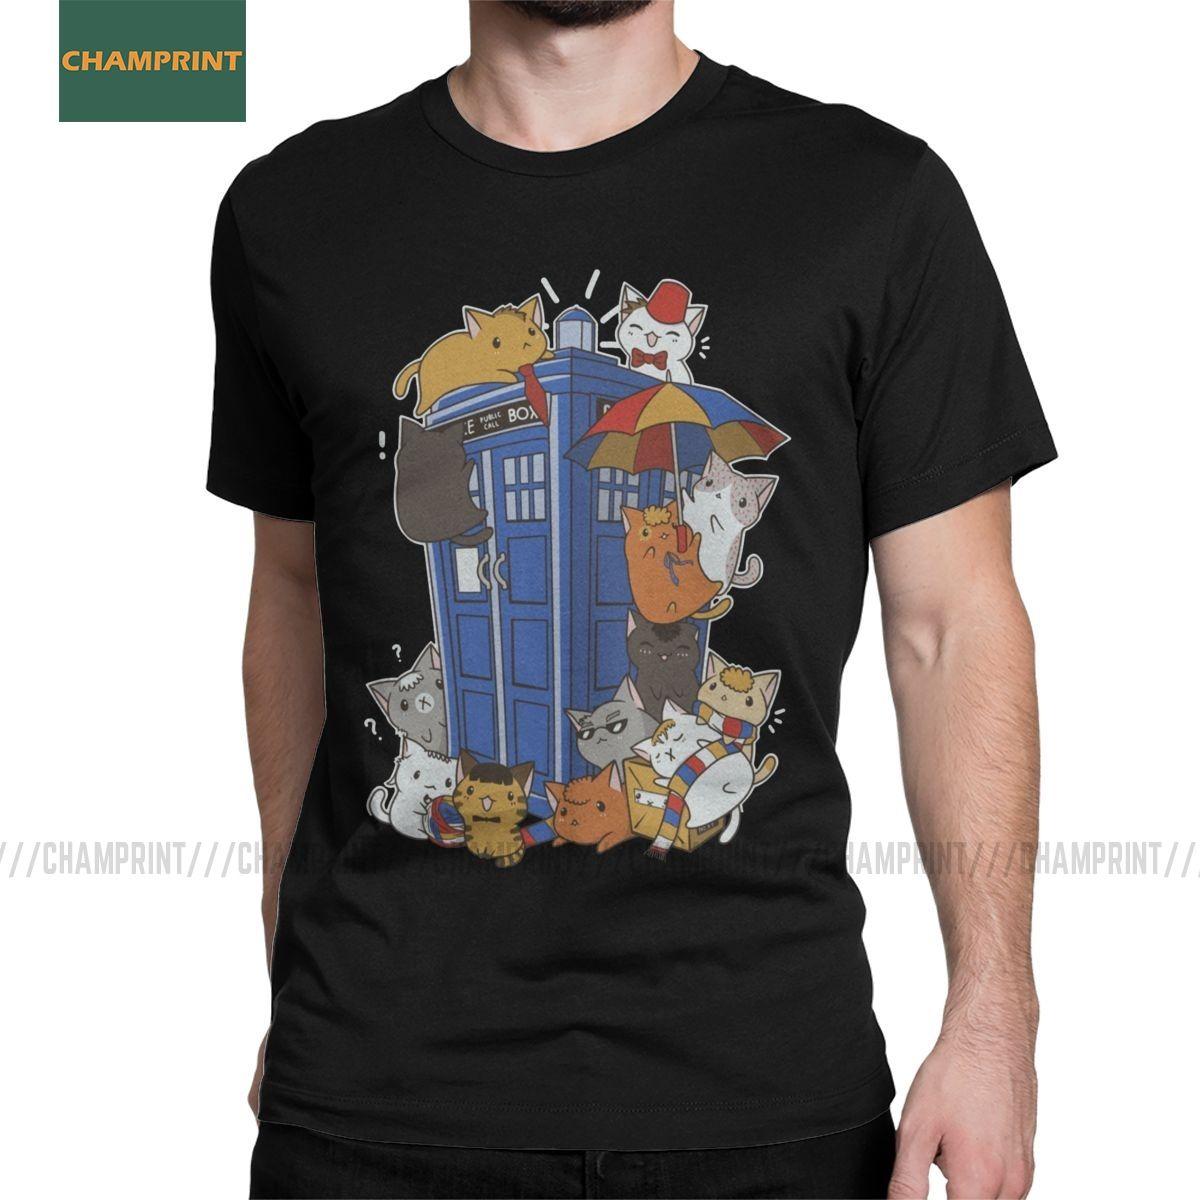 Gattino uomo Who Doctor Who maglietta Tardis Gallifrey Timelord Blue Box Tops puro cotone manica corta Tees 4XL 5XL T-shirt